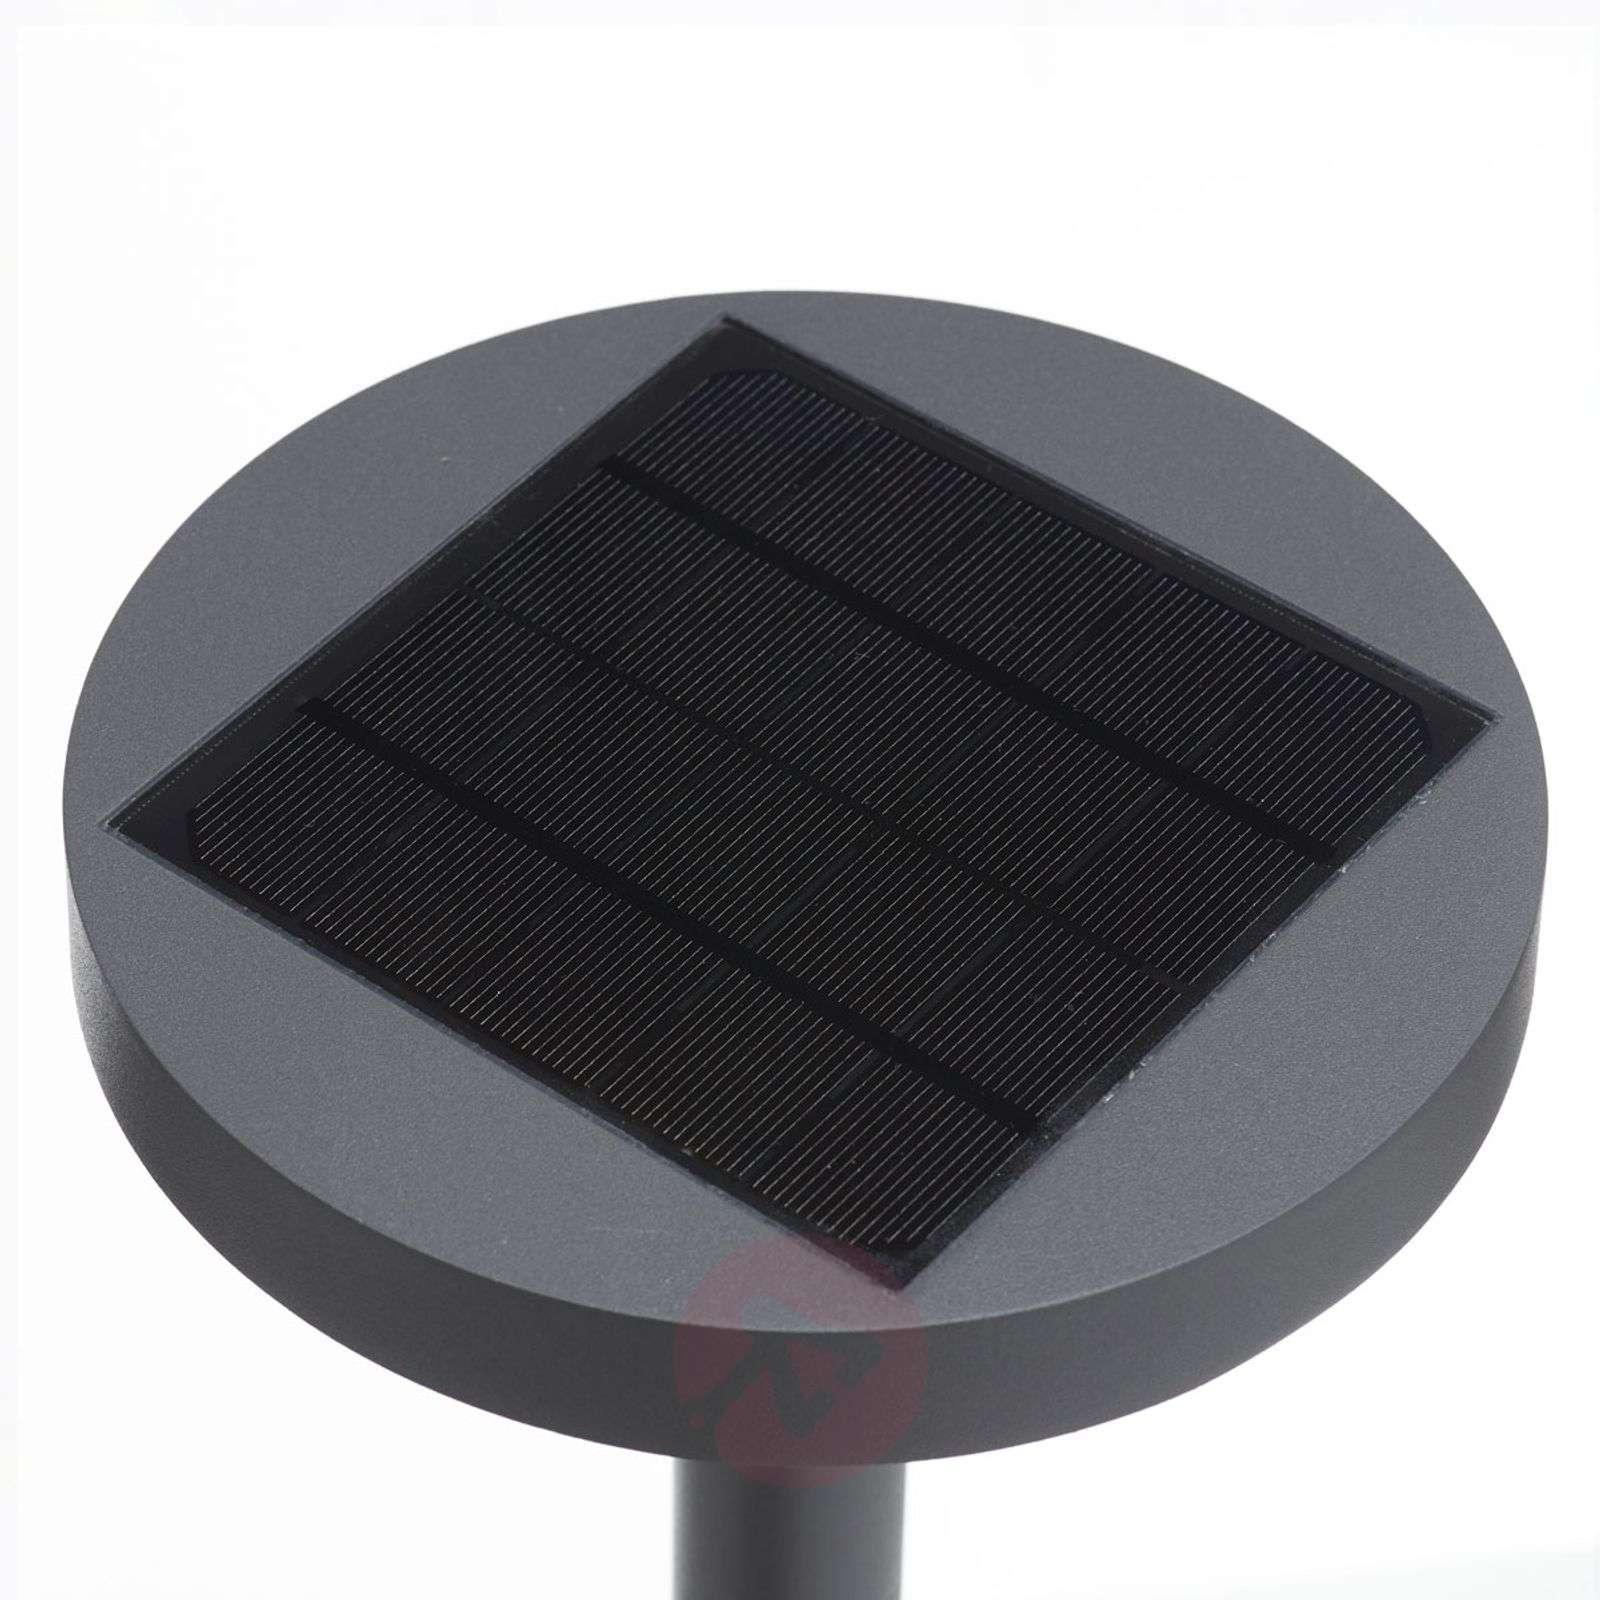 Aurinkokäyt. LED-pylväsvalo Linja pyöreä t.harmaa-9616154-02